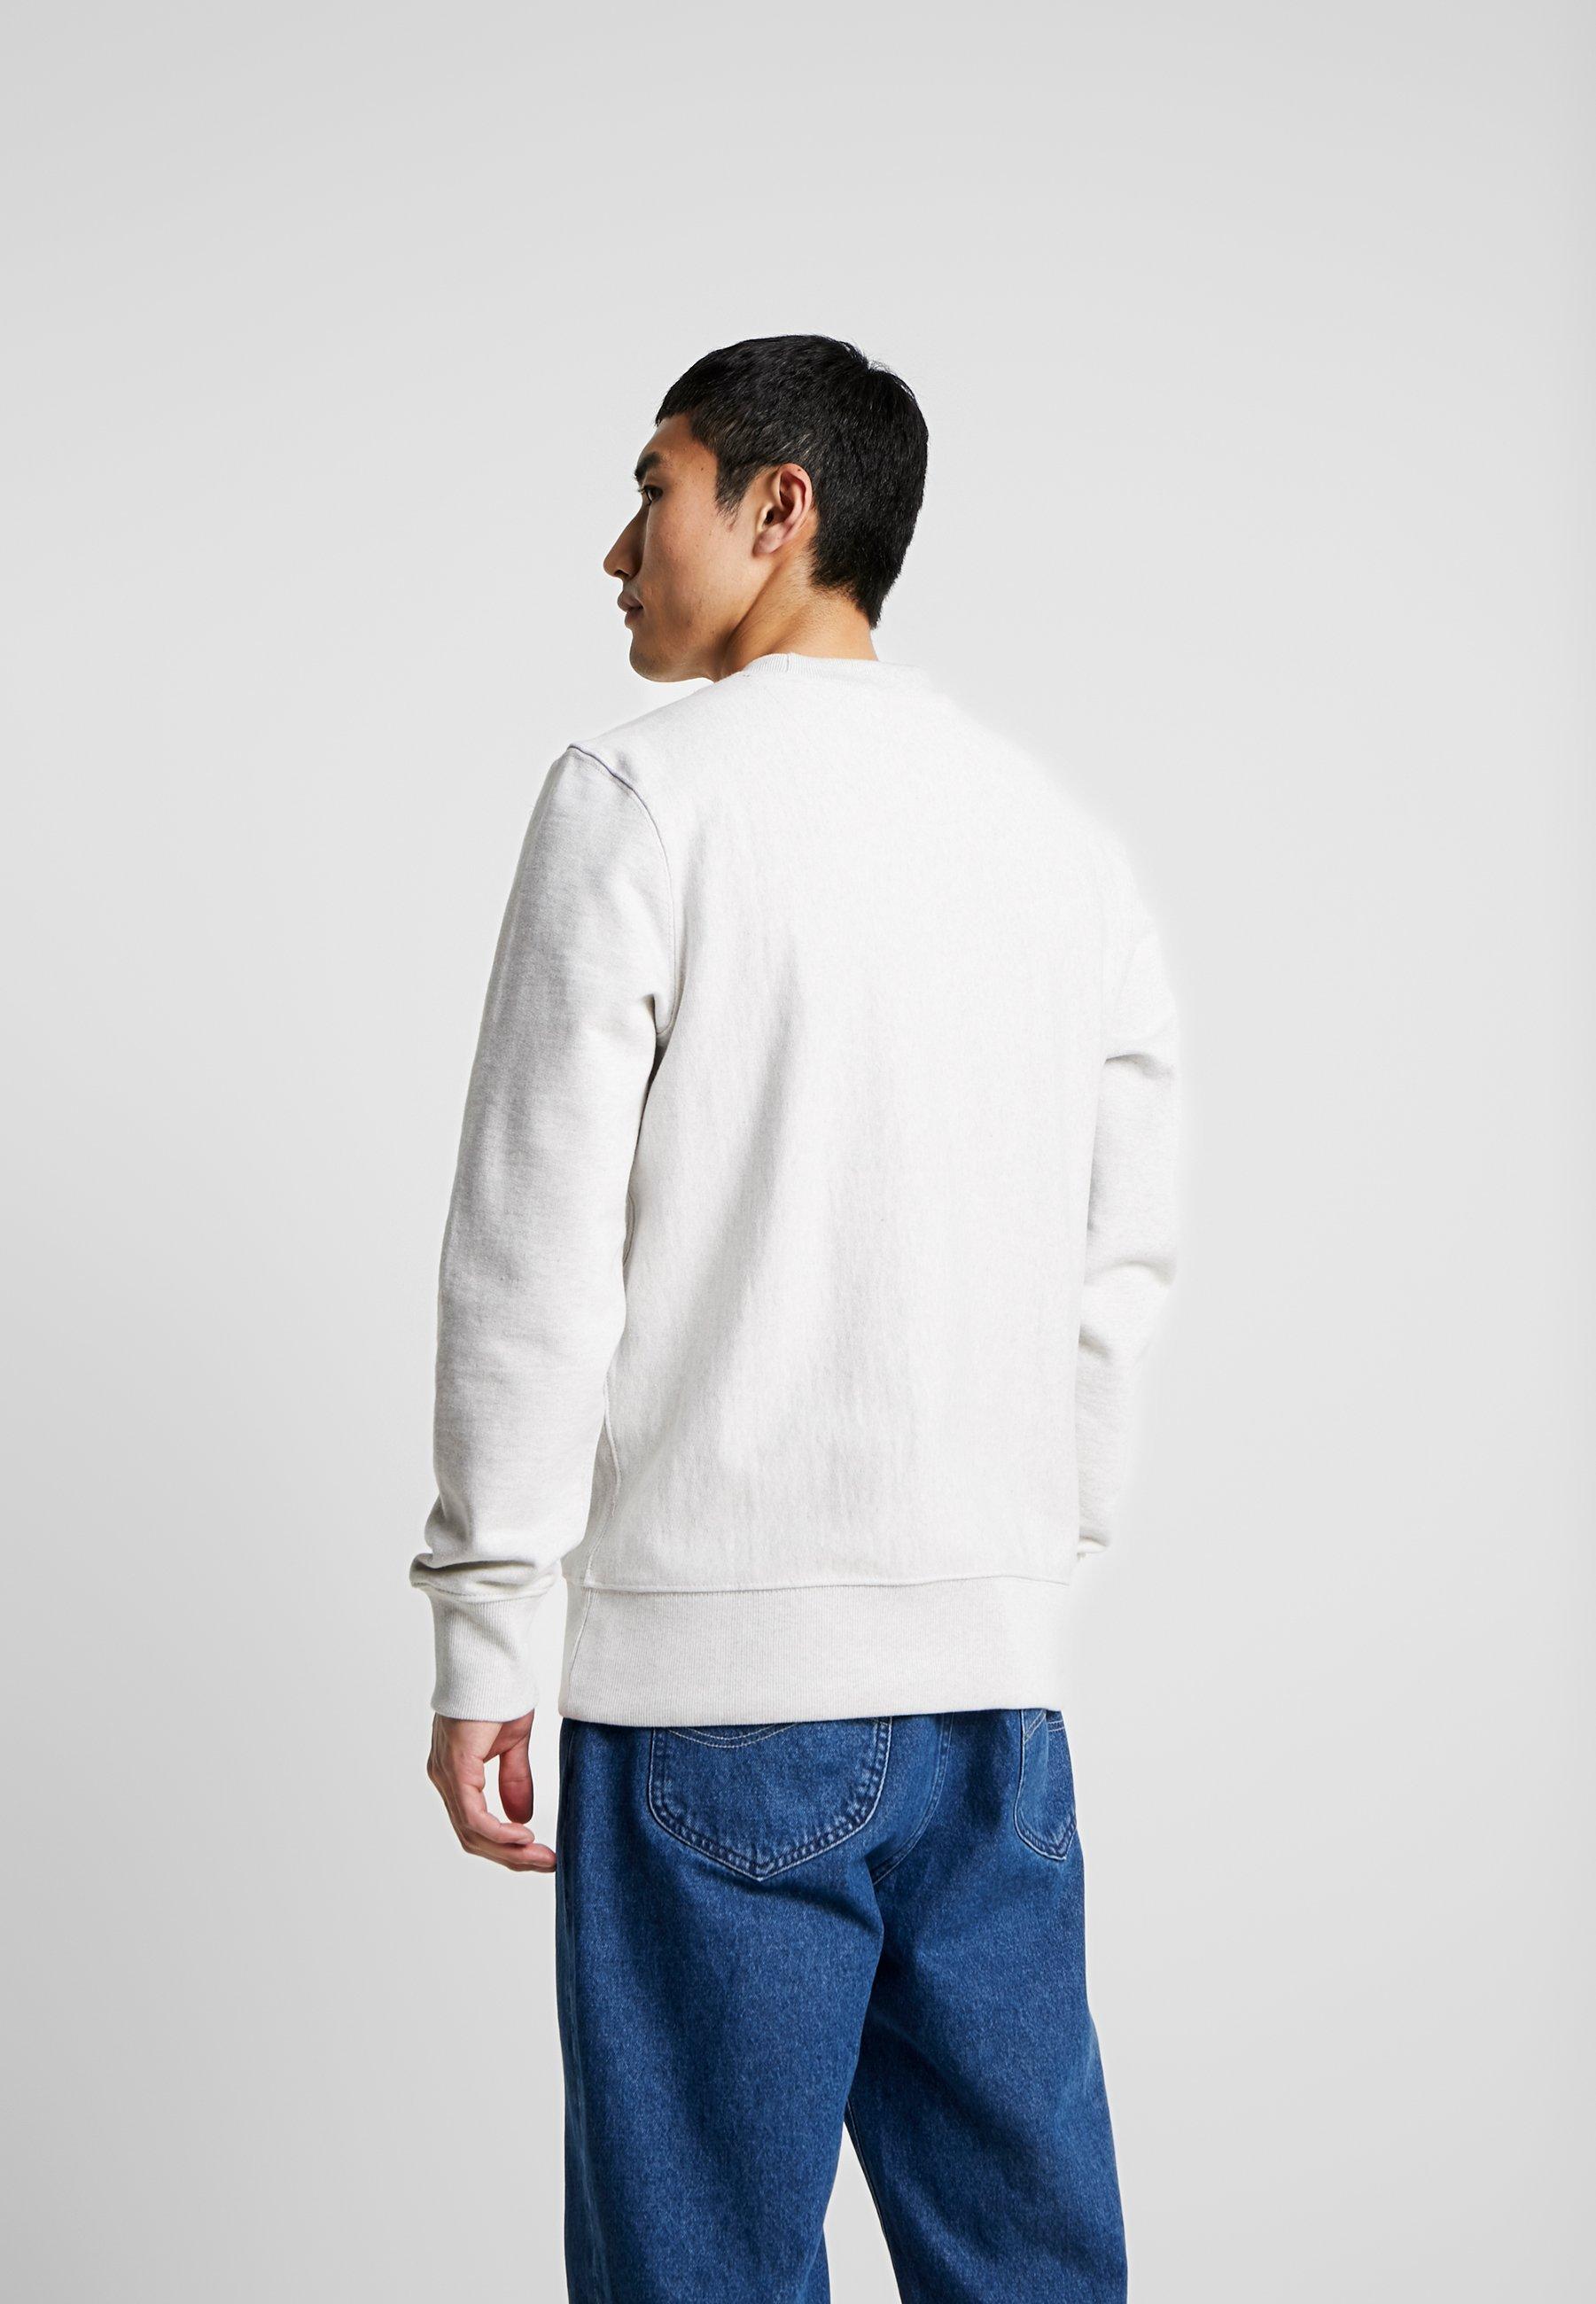 rdd Jones Crew Basic NeckSweatshirt Melange White Jackamp; Jj SAc5R43qjL